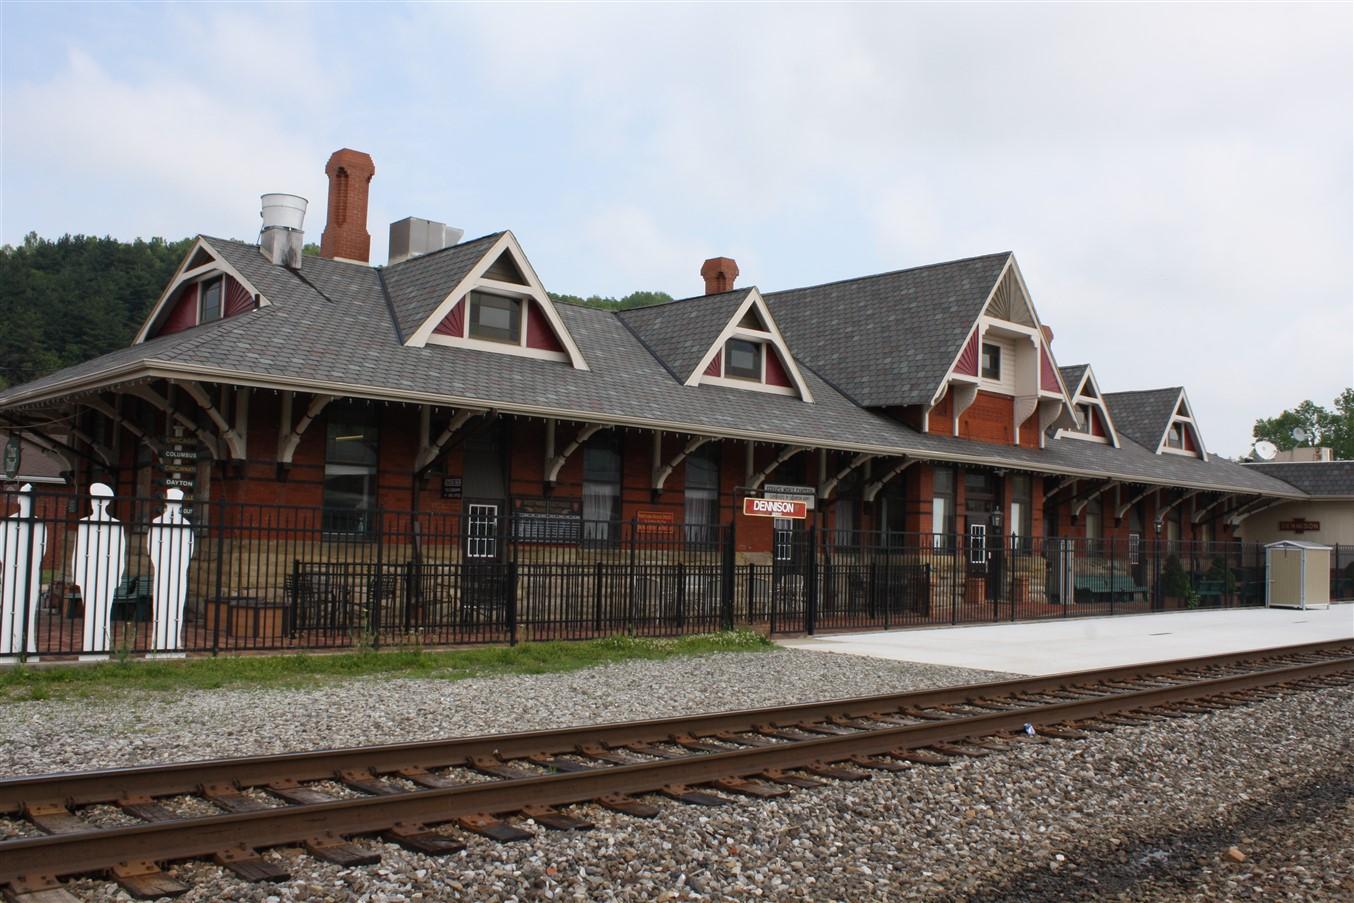 2012 05 05 Dennison Ohio Train Station Museum 9.jpg